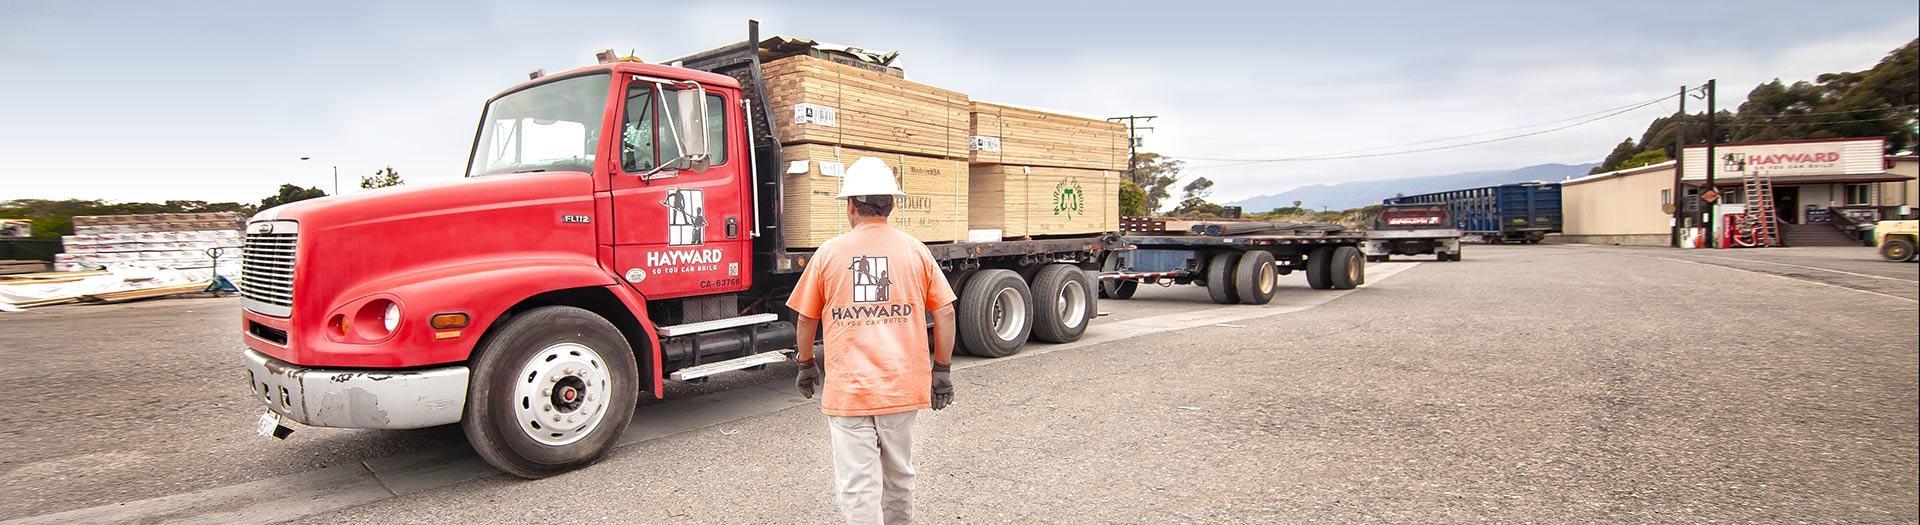 Hayward Lumber - Goleta image 2